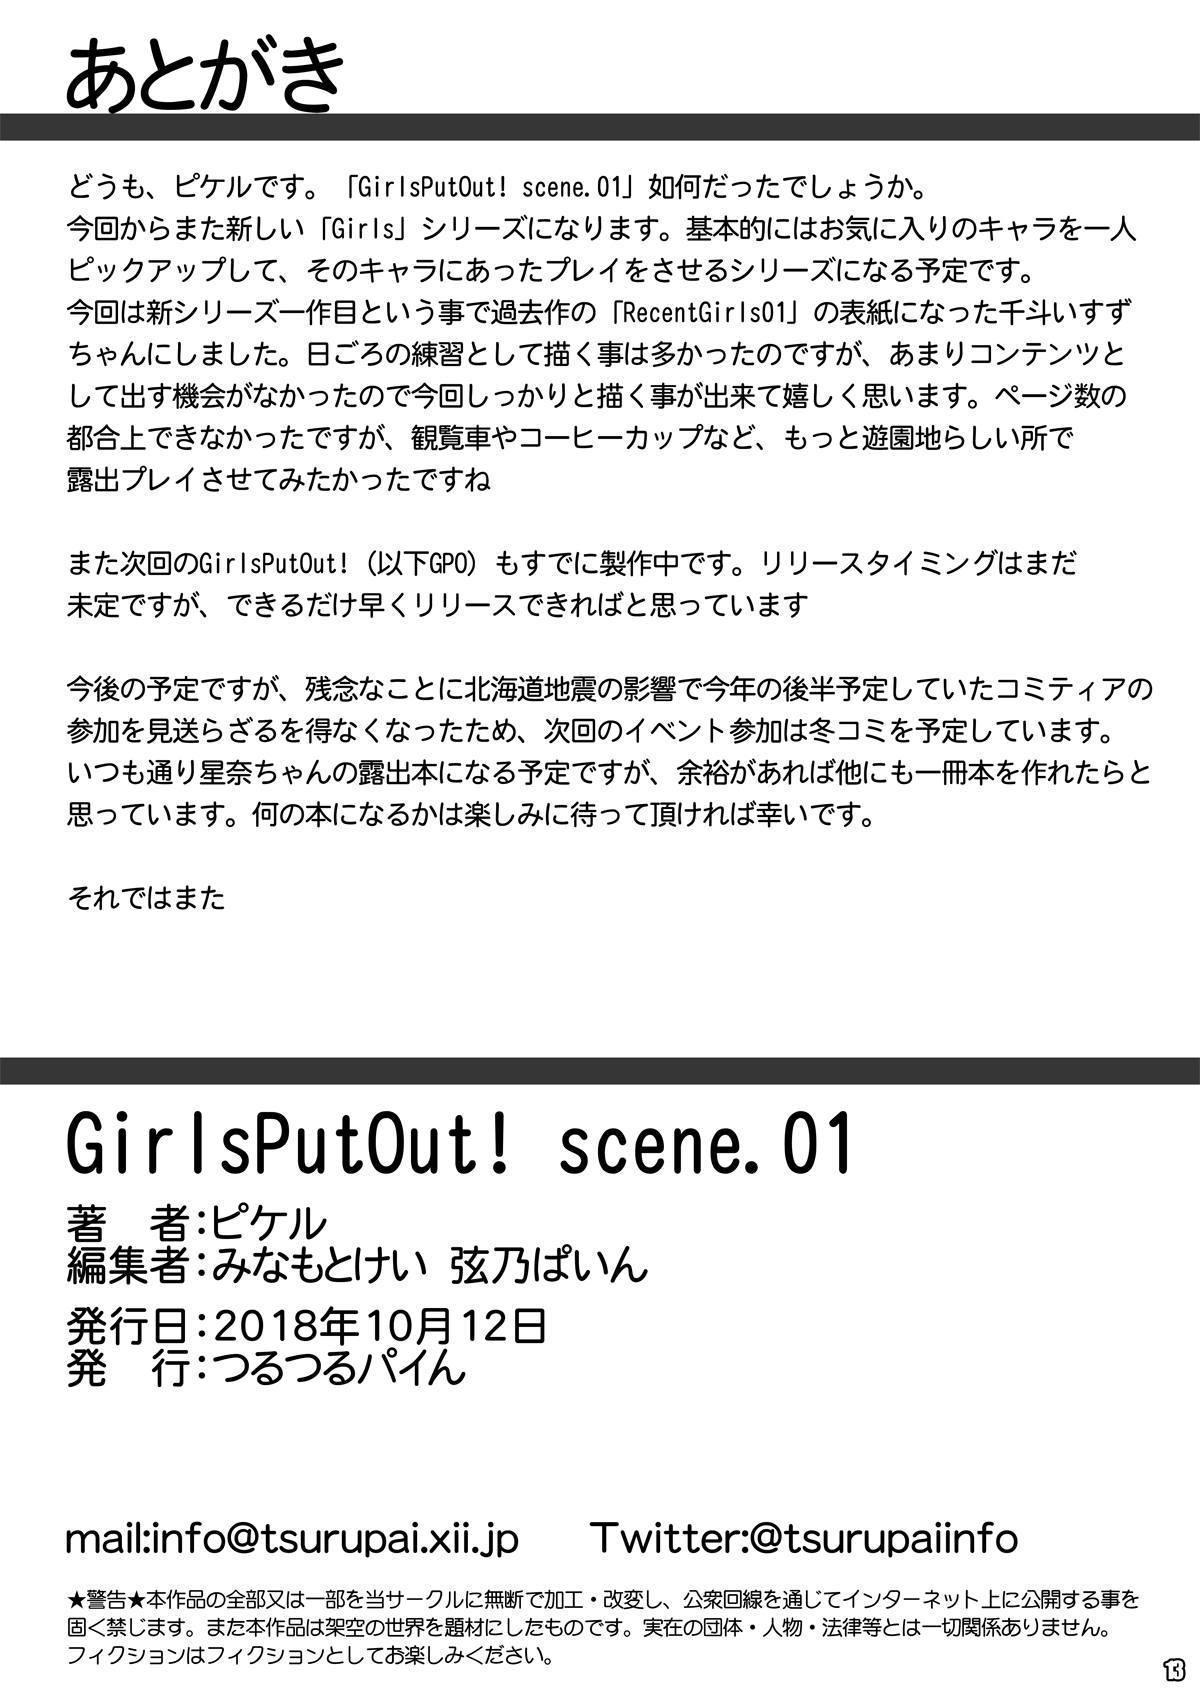 GirlsPutOut! scene.01 11